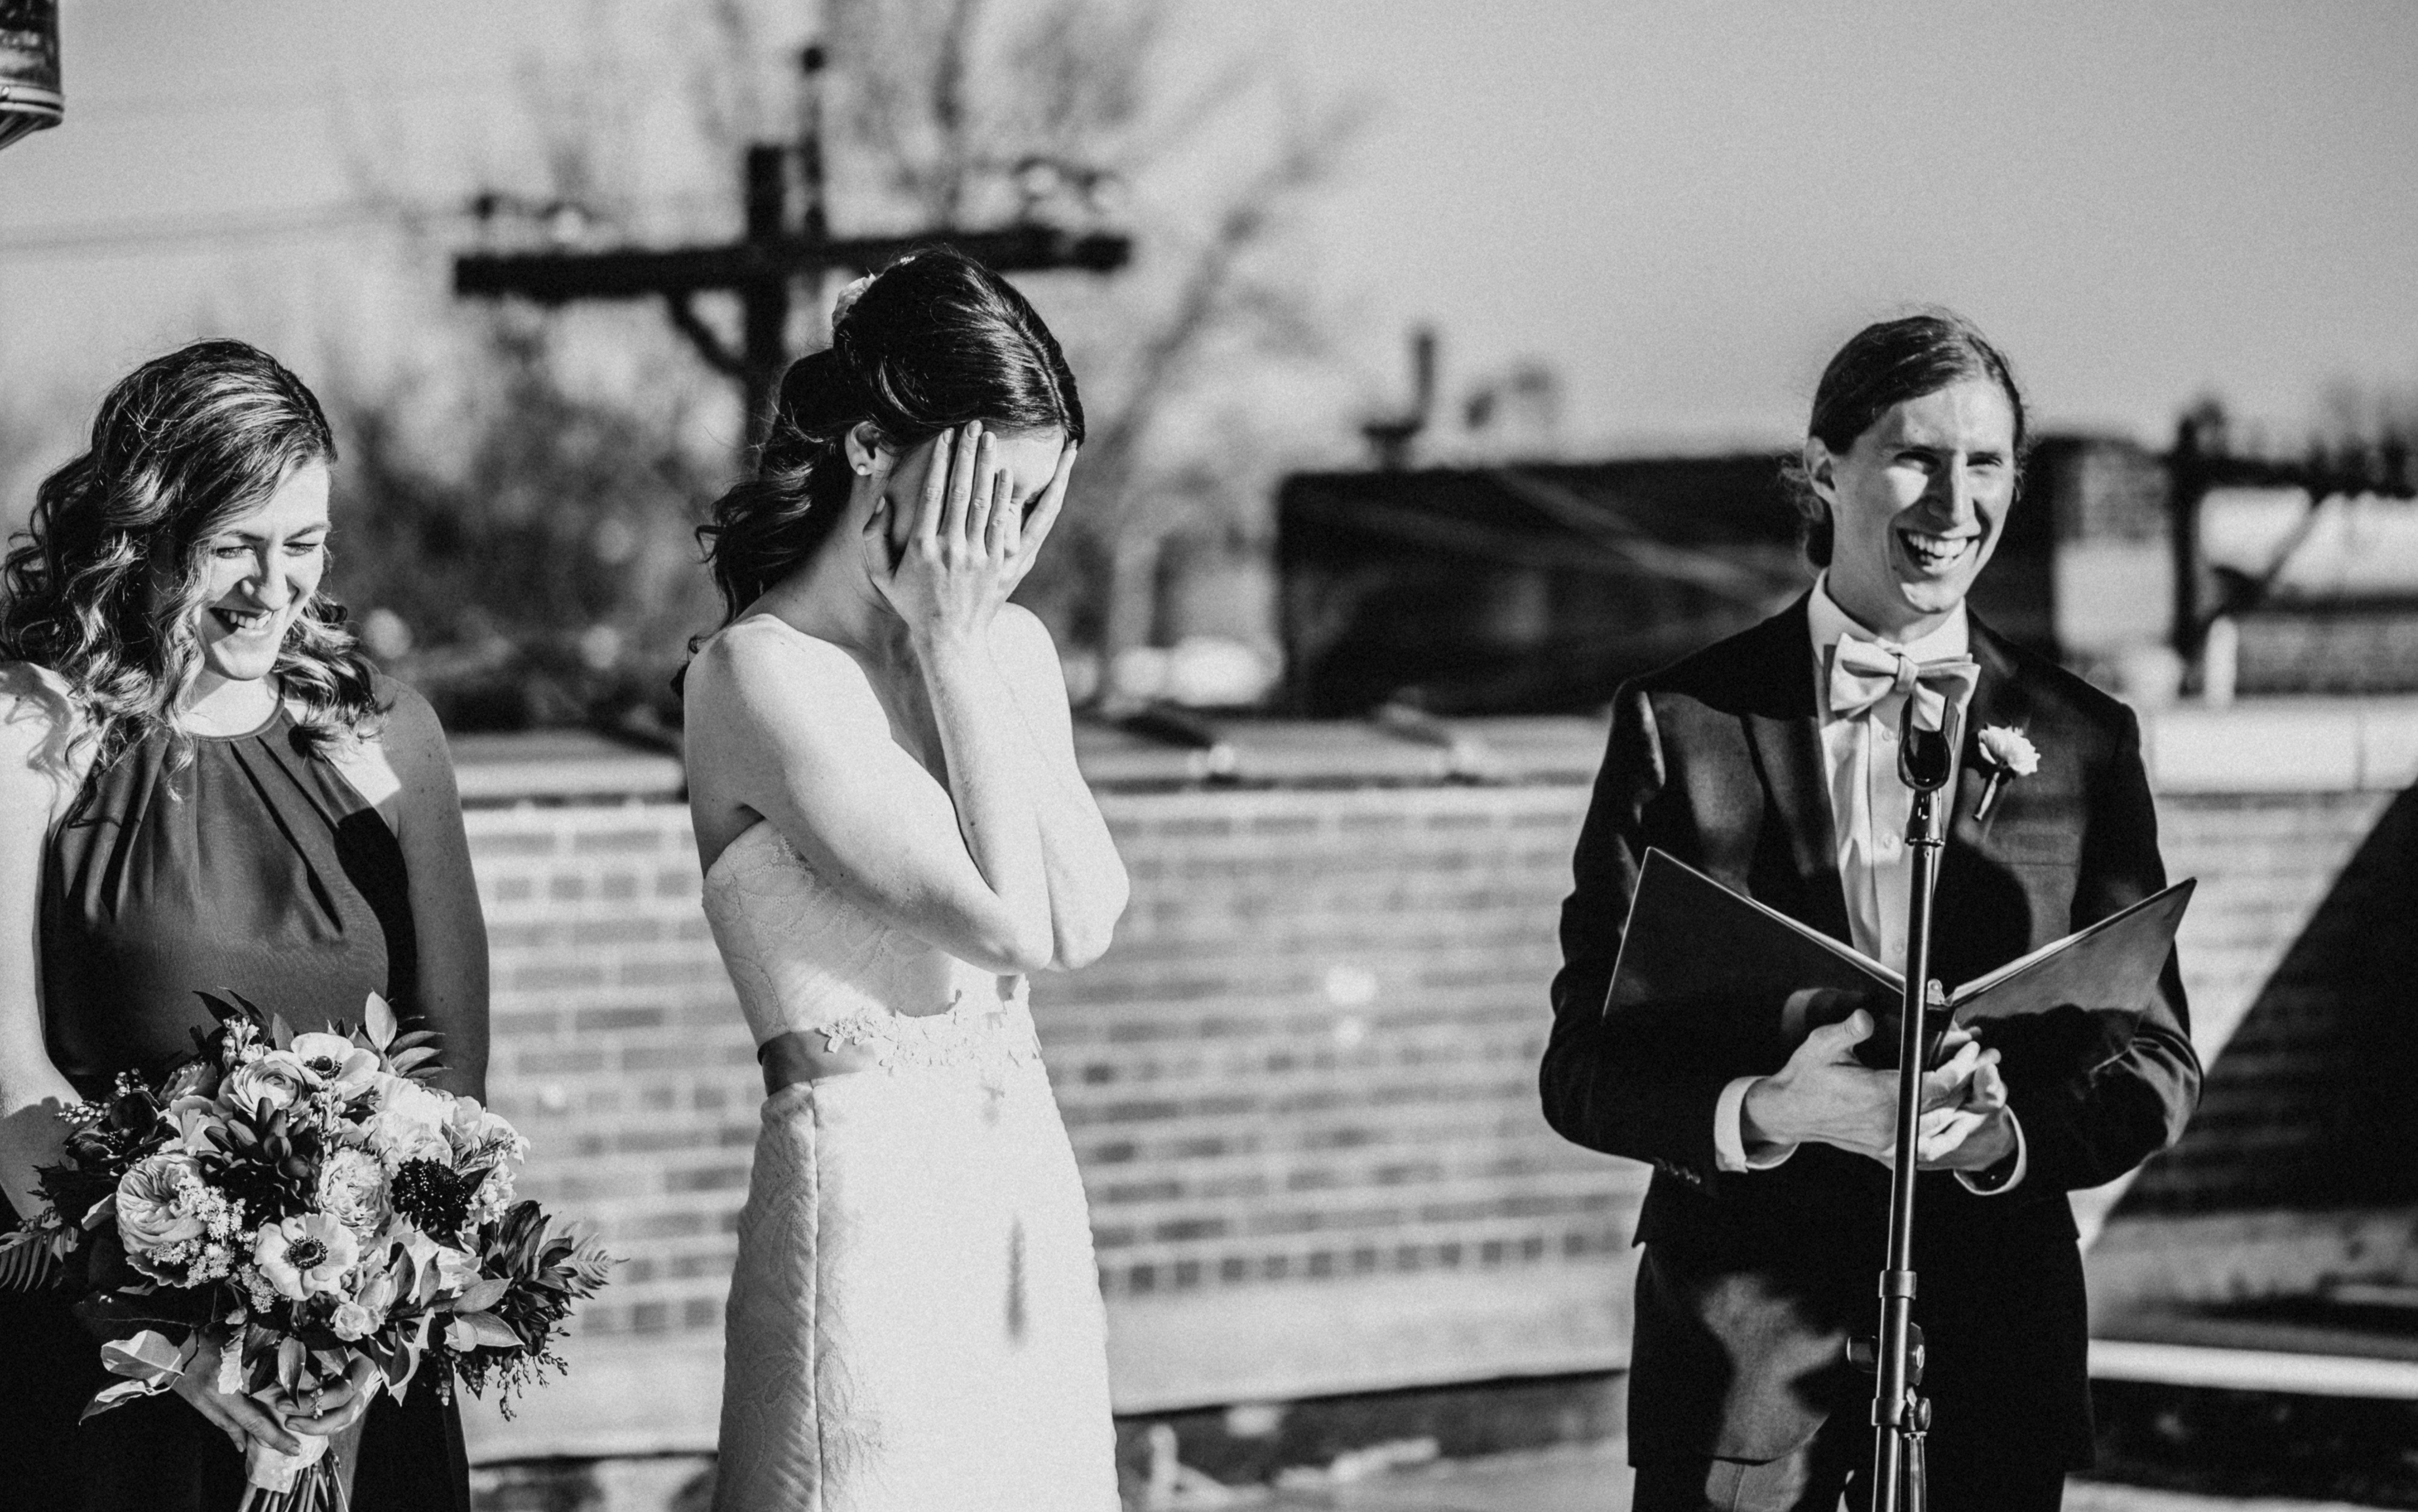 Fun ceremony wedding on rooftop